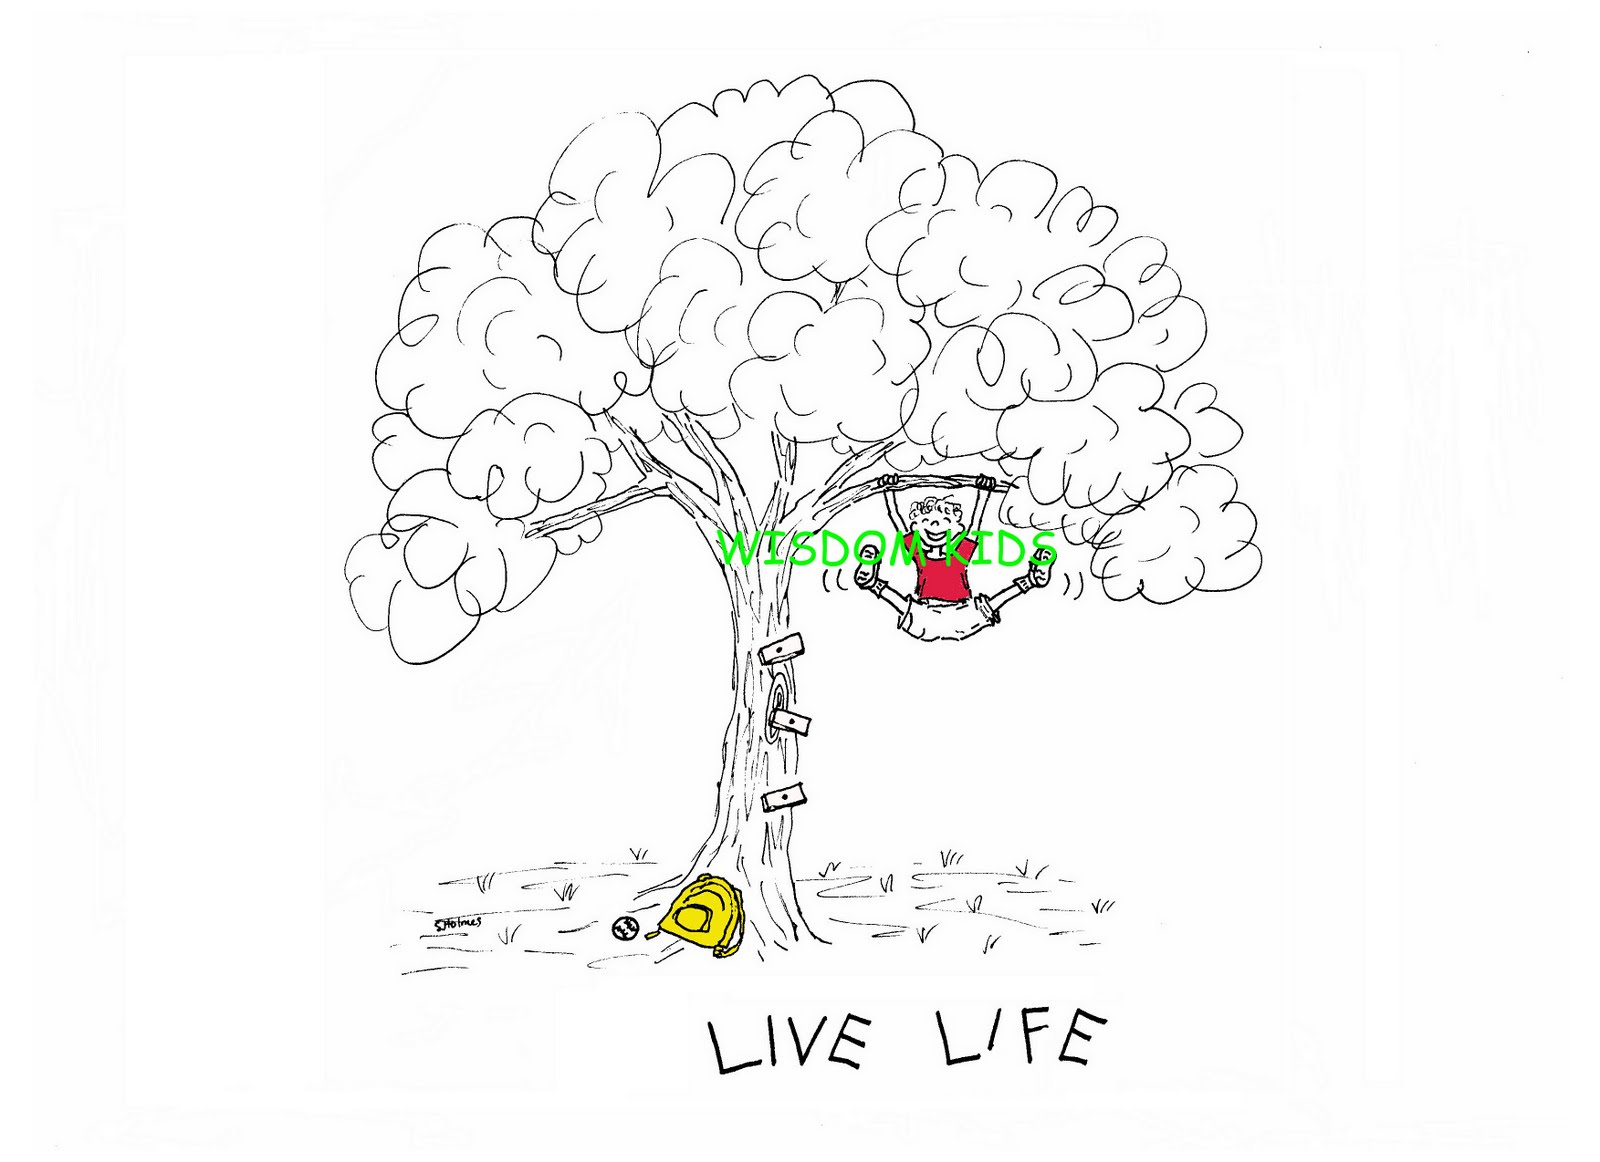 Wisdom Kids Inspirational Illustrations Special T Shirt